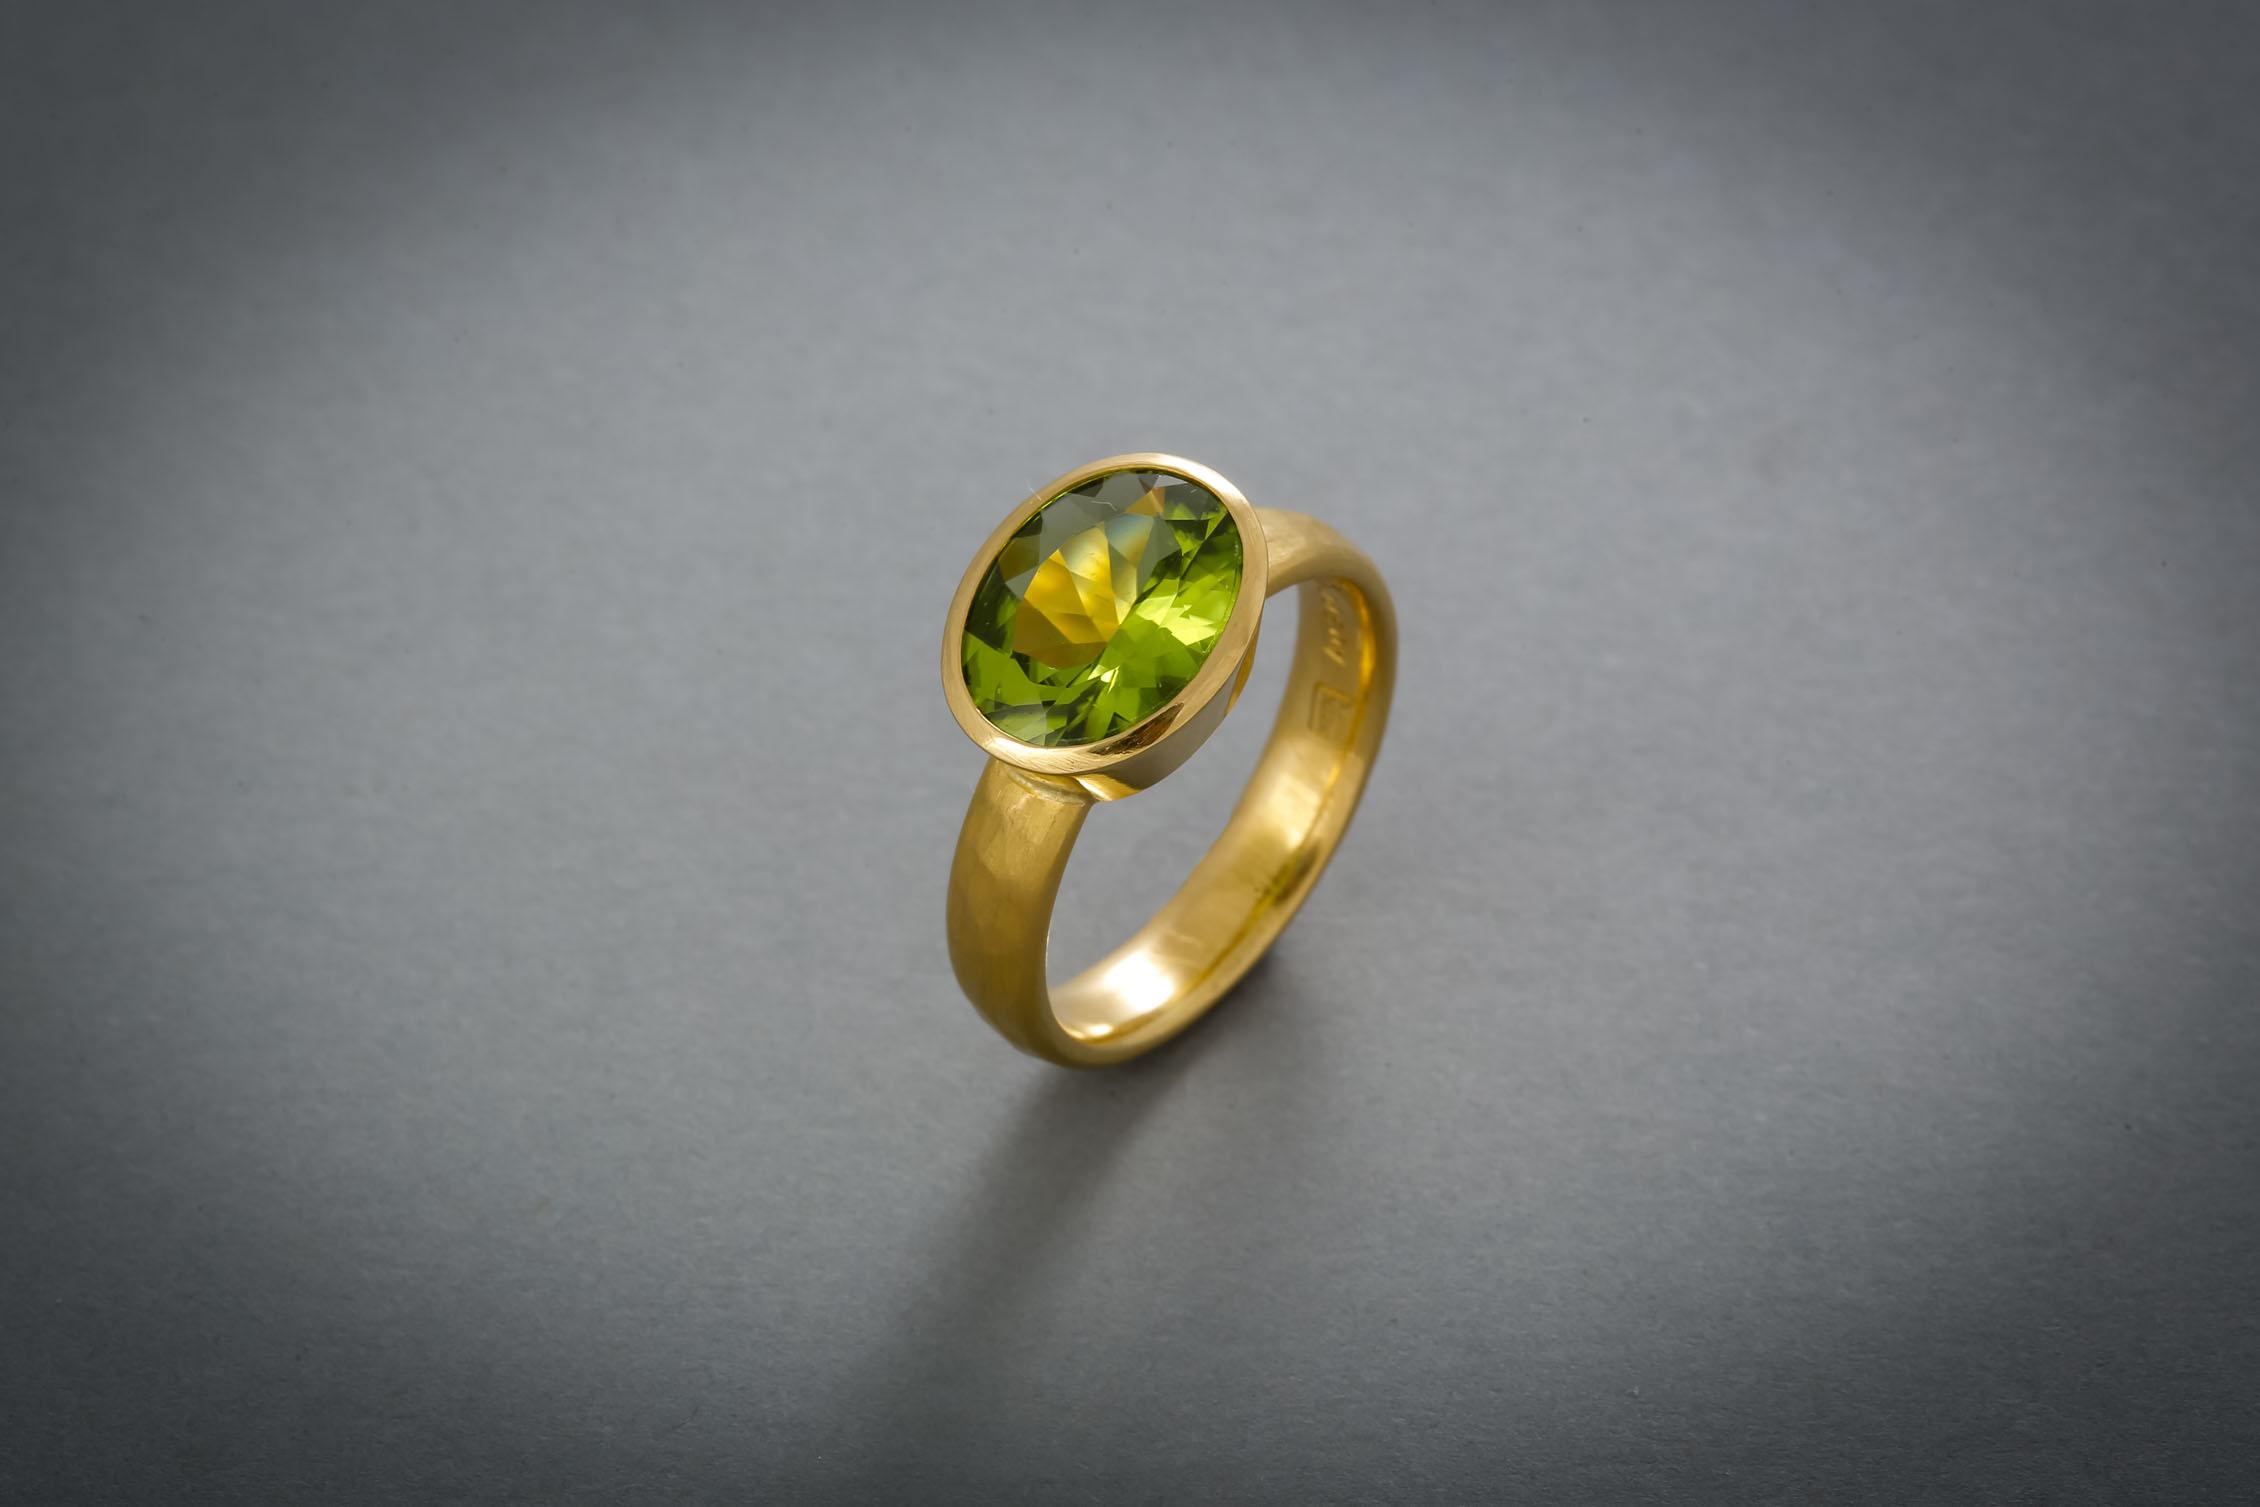 059 21kt Goldring, Peridot, Preis auf Anfrage